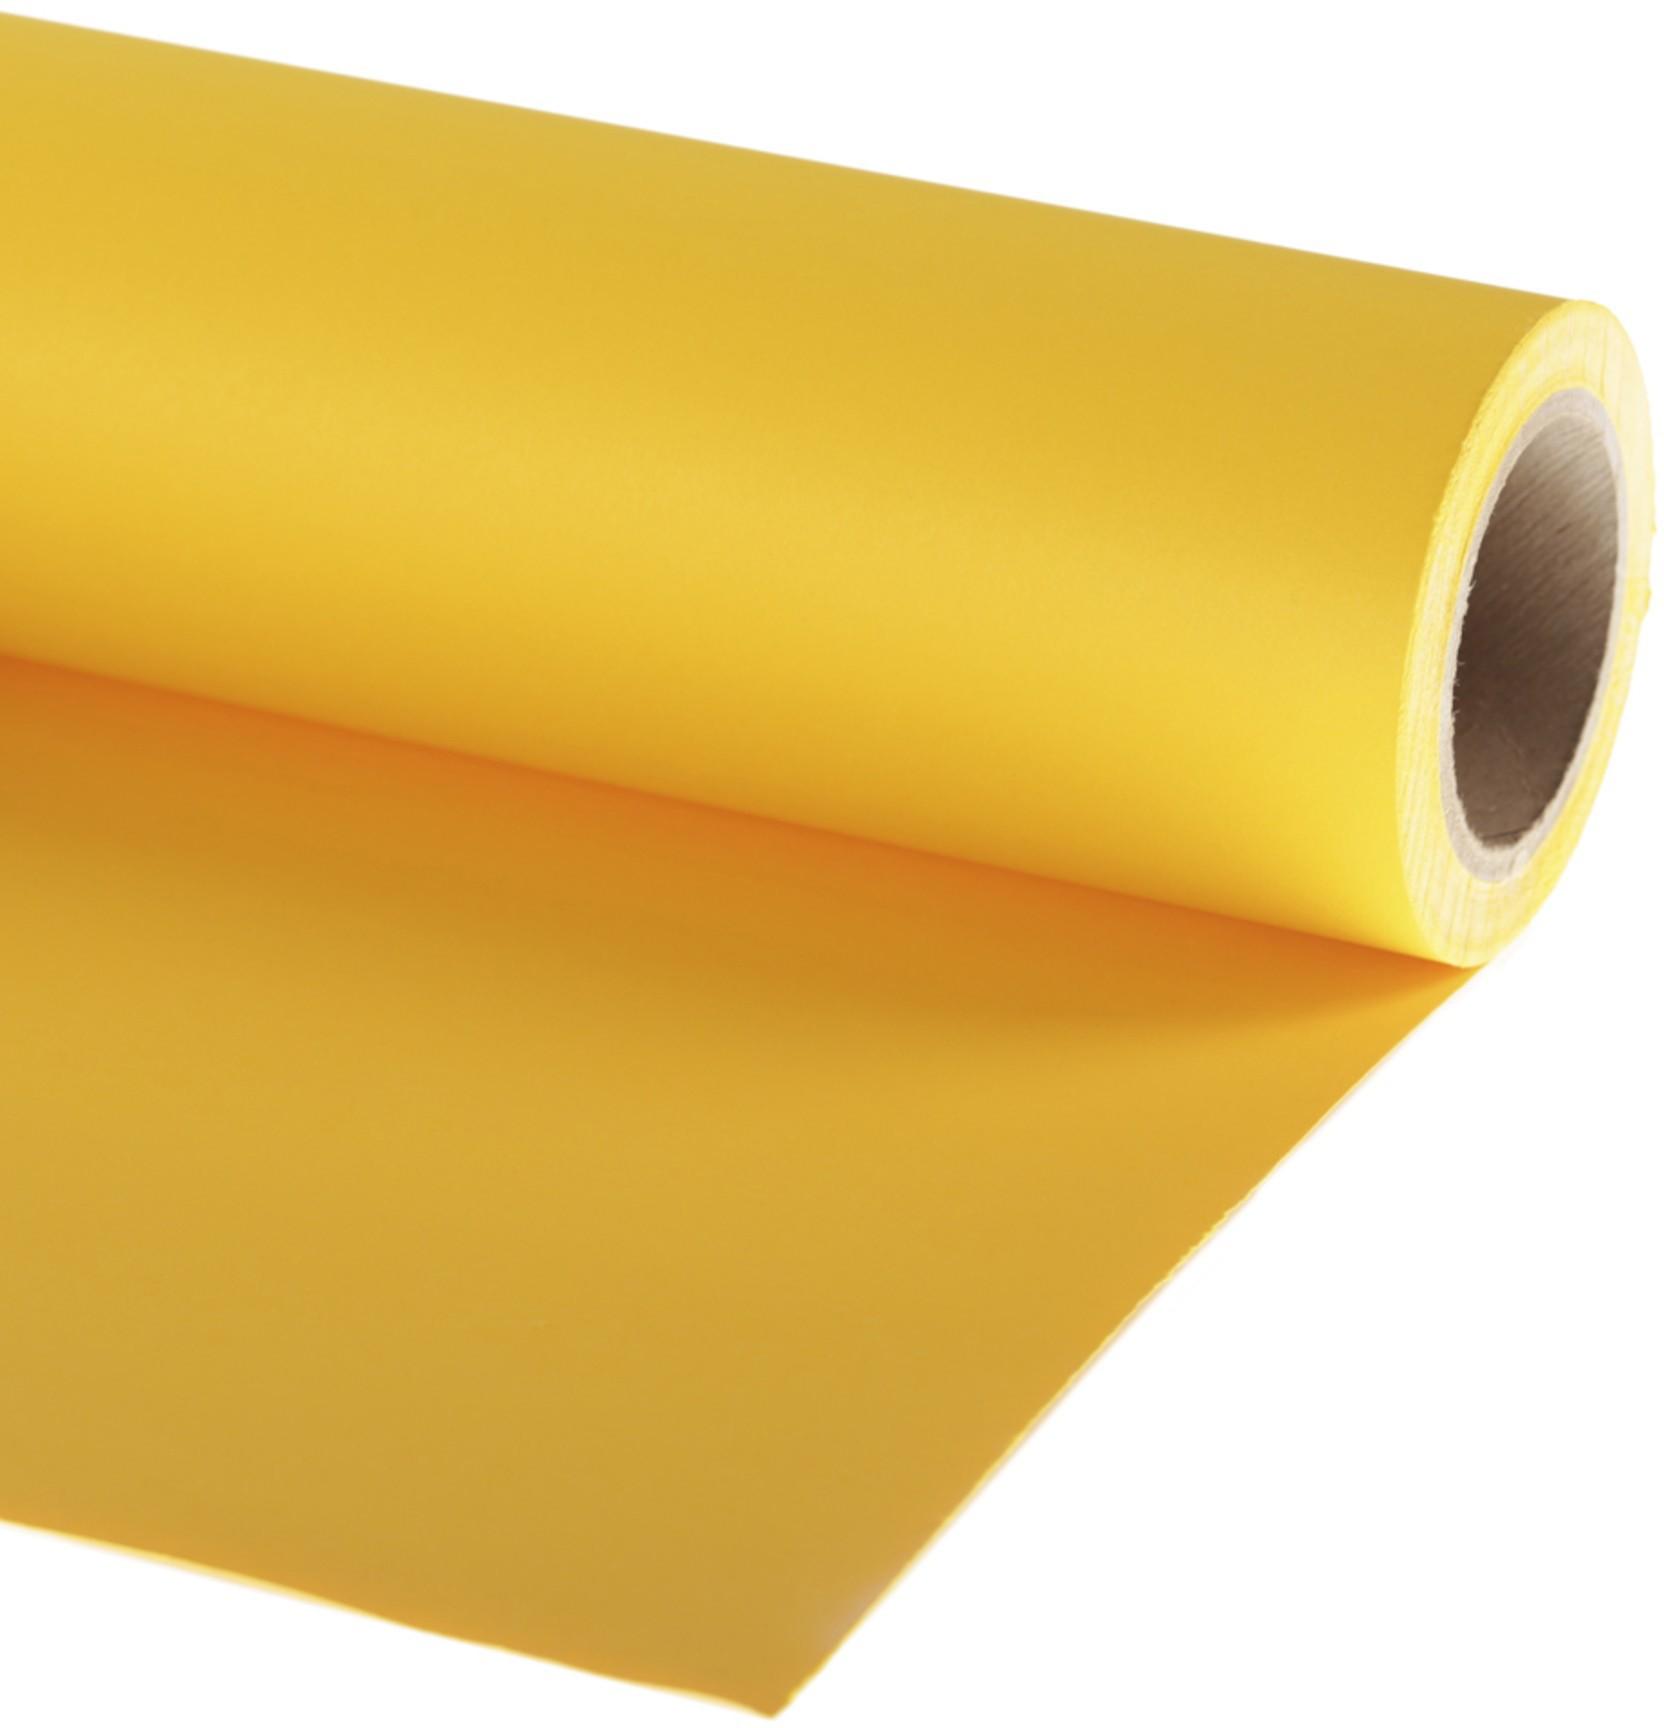 Lastolite paberfoon 2,75x11m, yellow (9071)